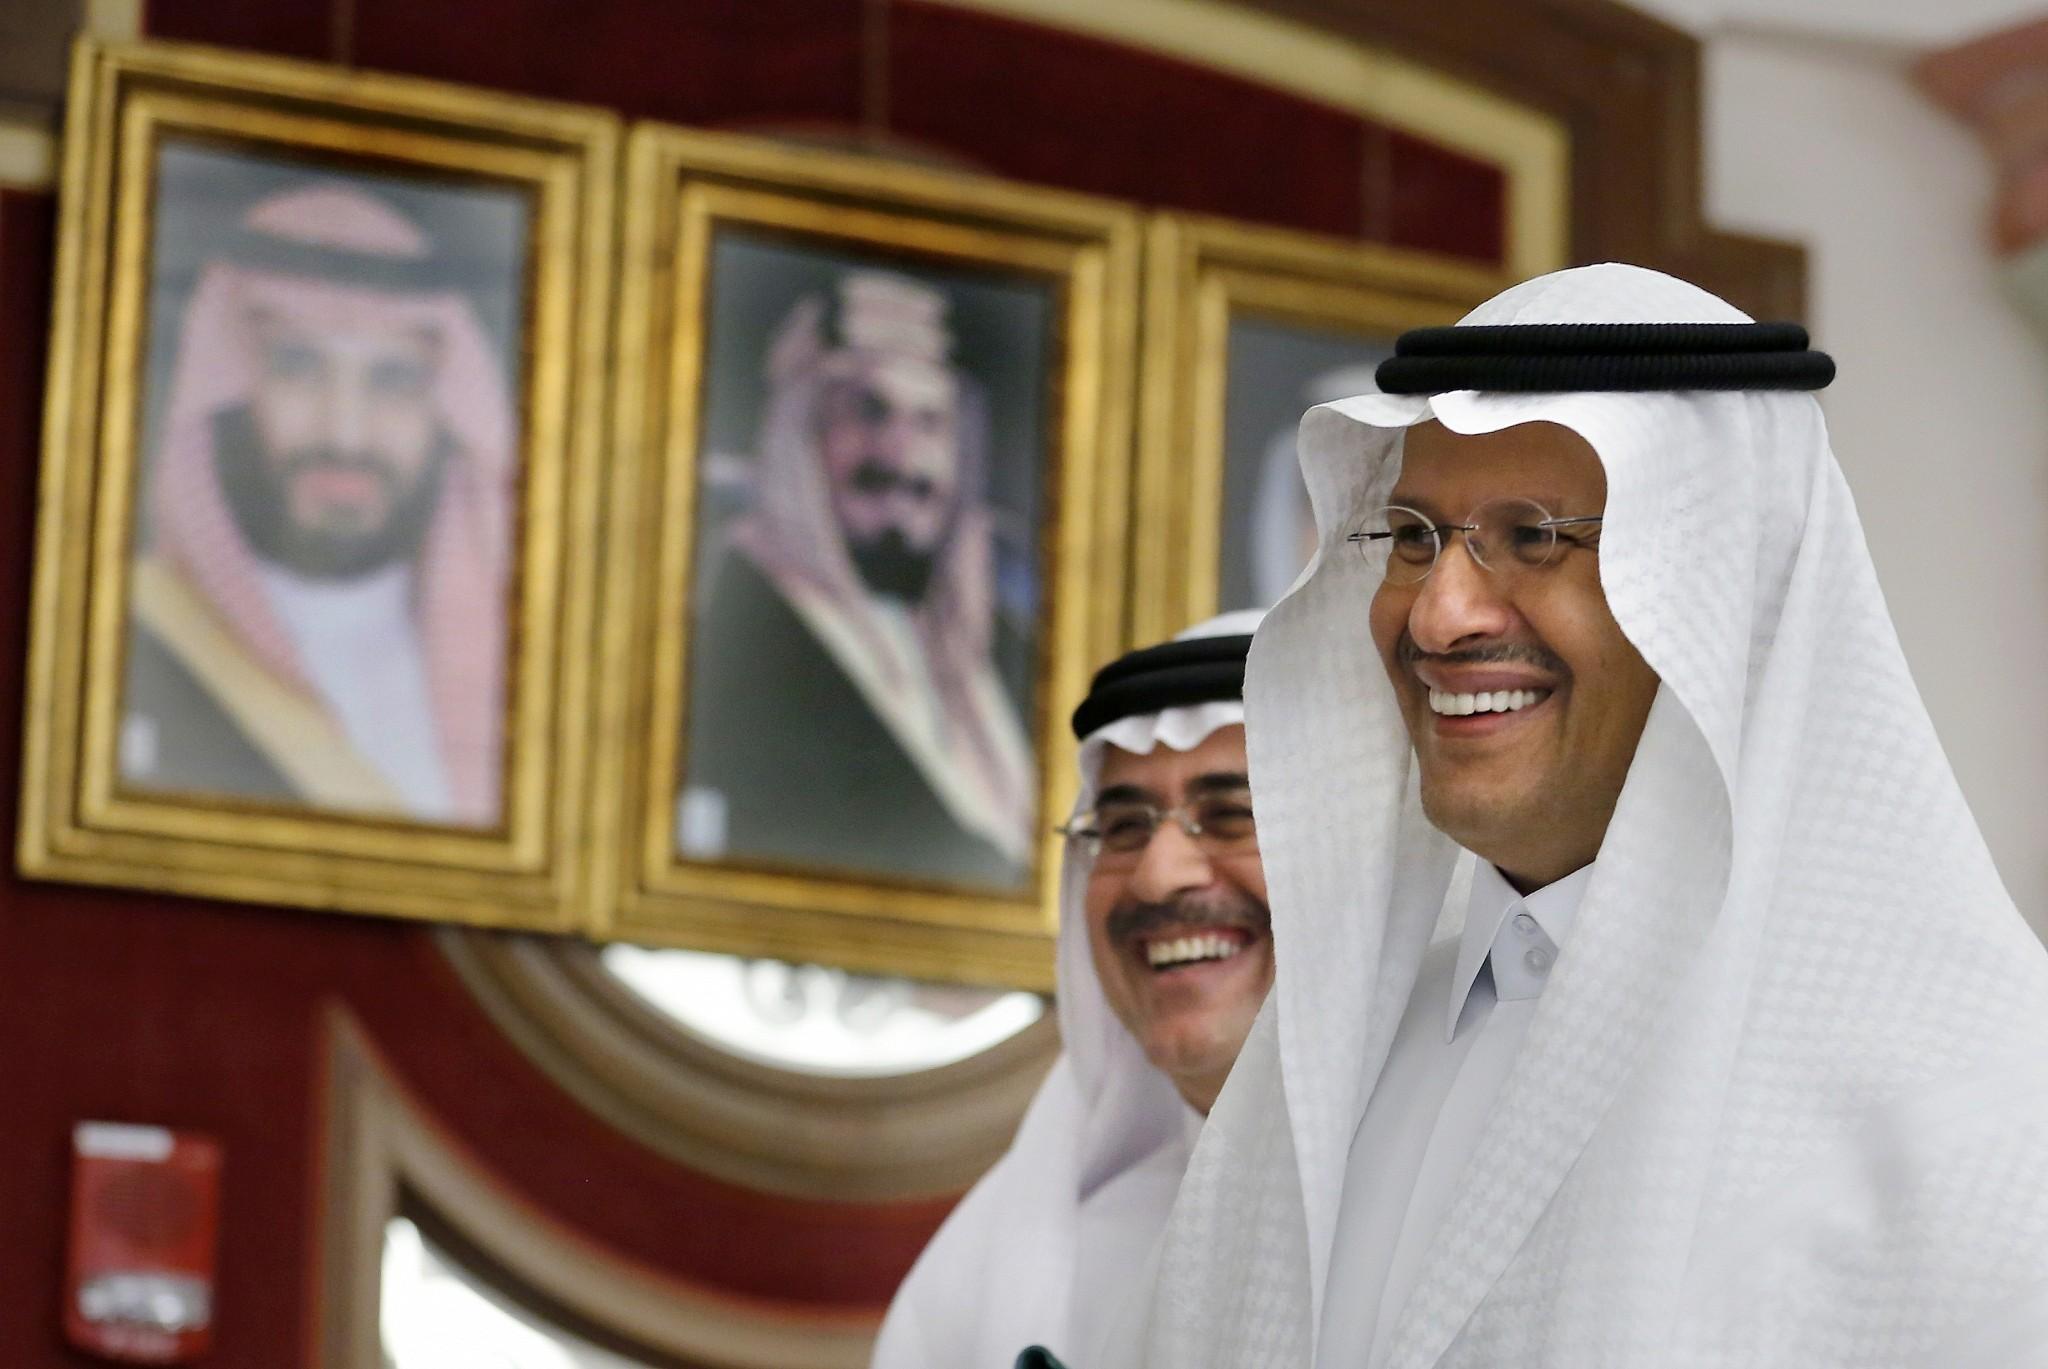 U.S., Gulf allies discuss possible responses to Saudi oil attack